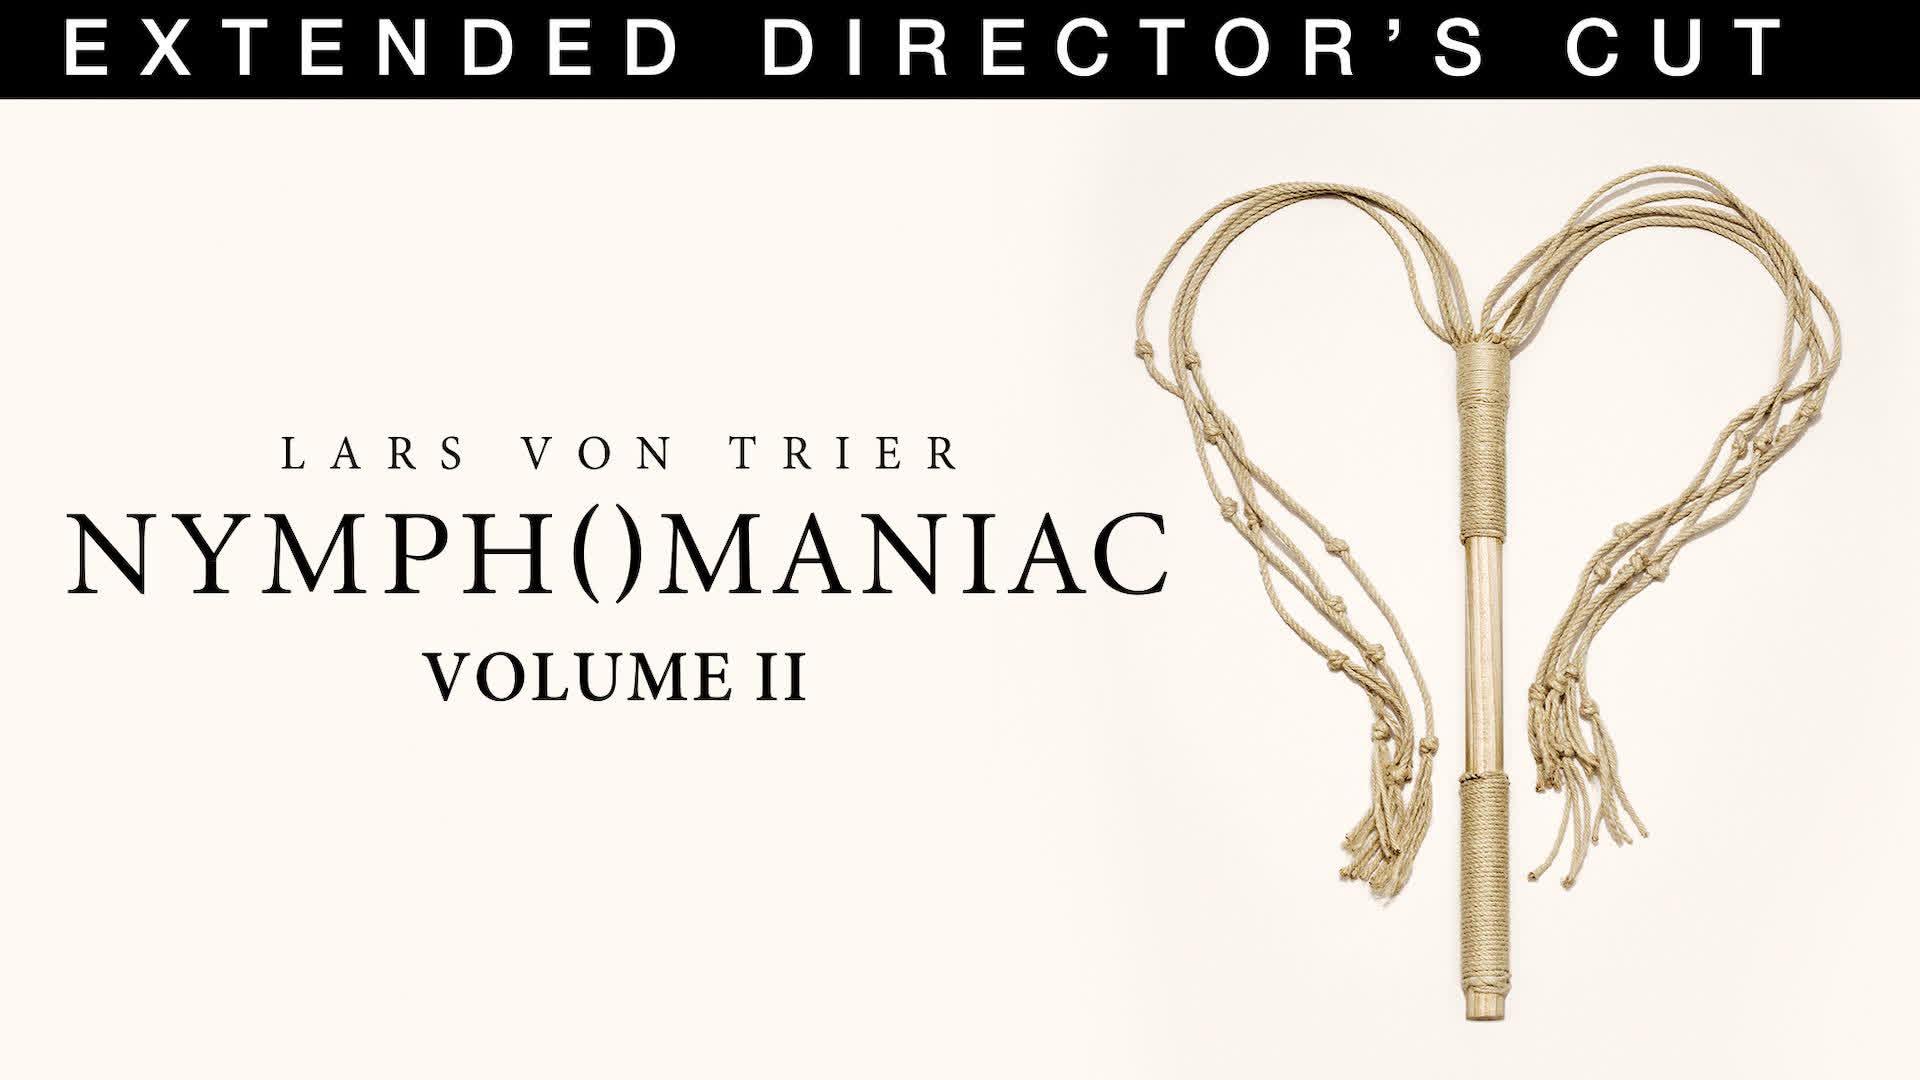 Nymphomaniac: Volume II (Extended Director's Cut)